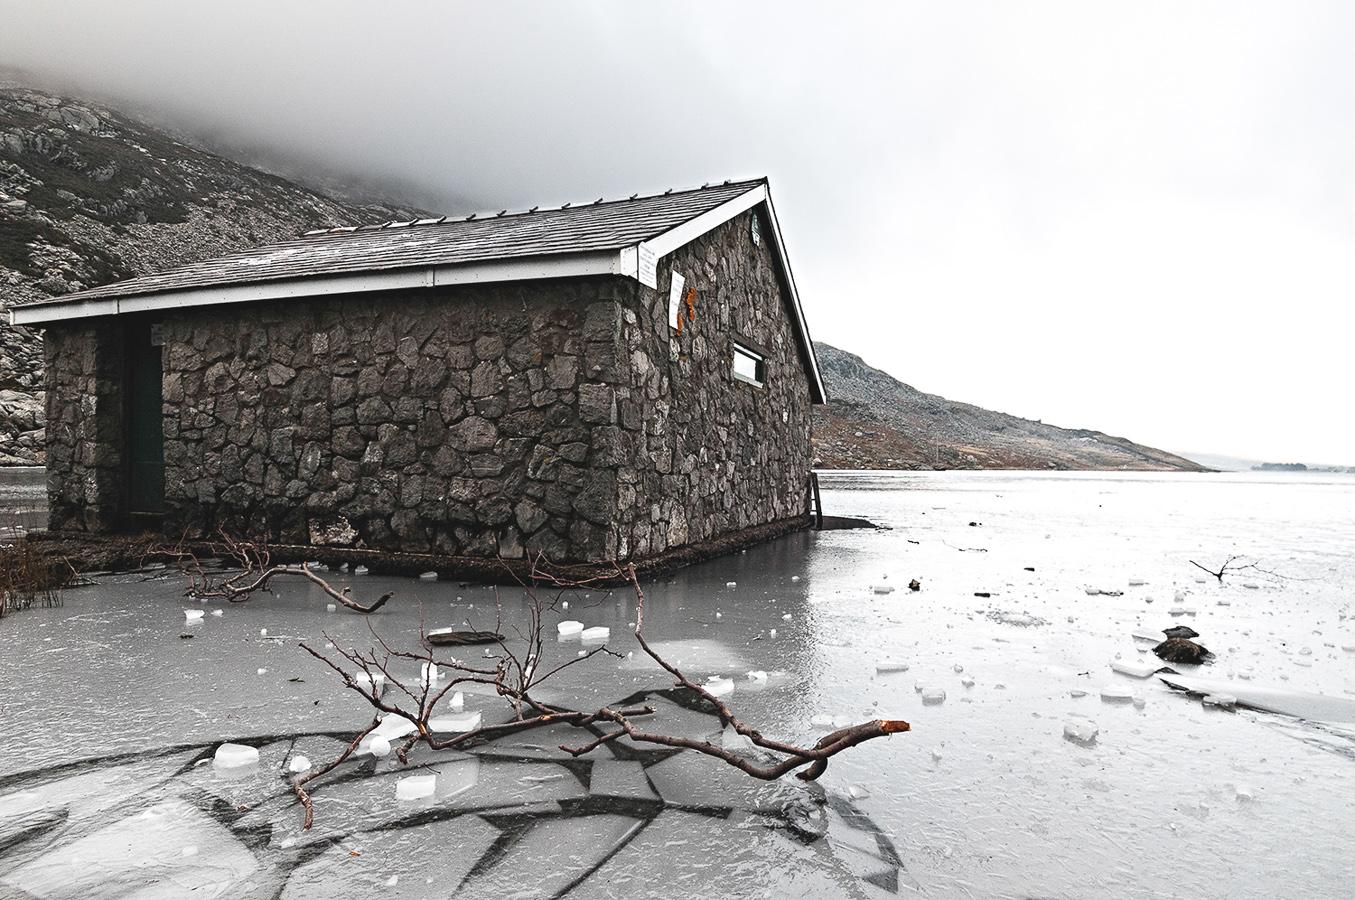 snowdonia-frozen-lake-house.jpg